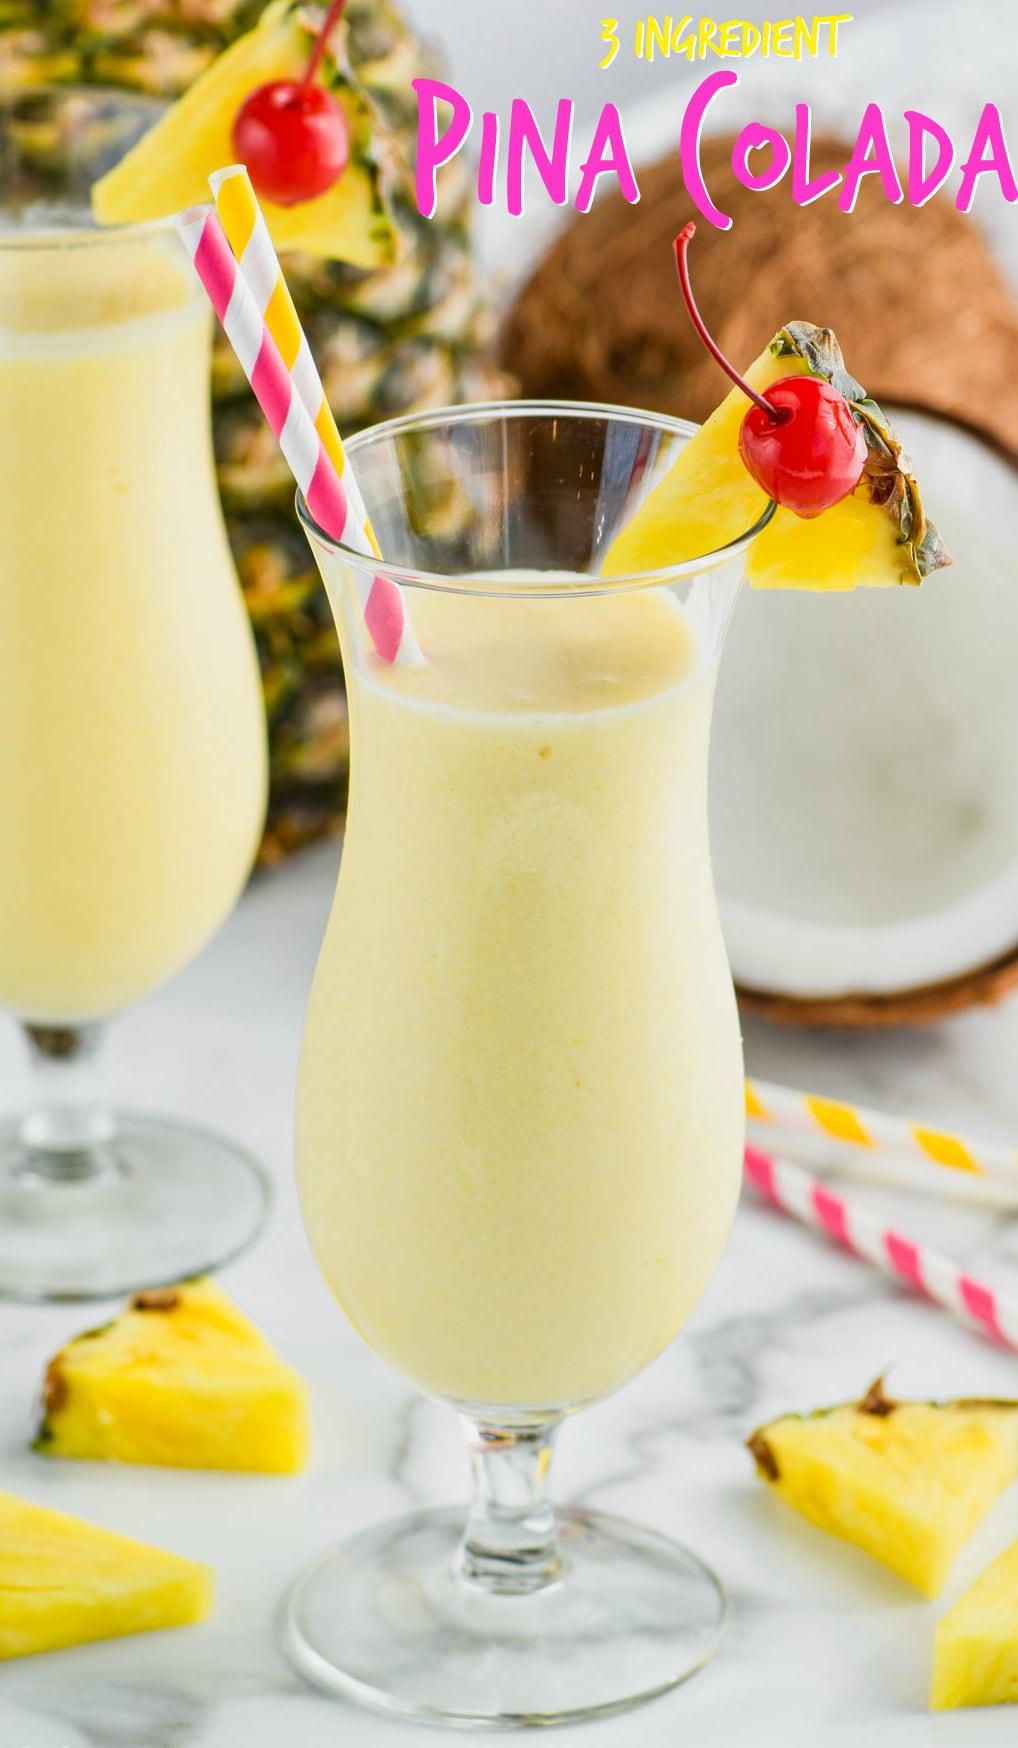 best_pina_colada_recipe_image - Shake Drink Repeat